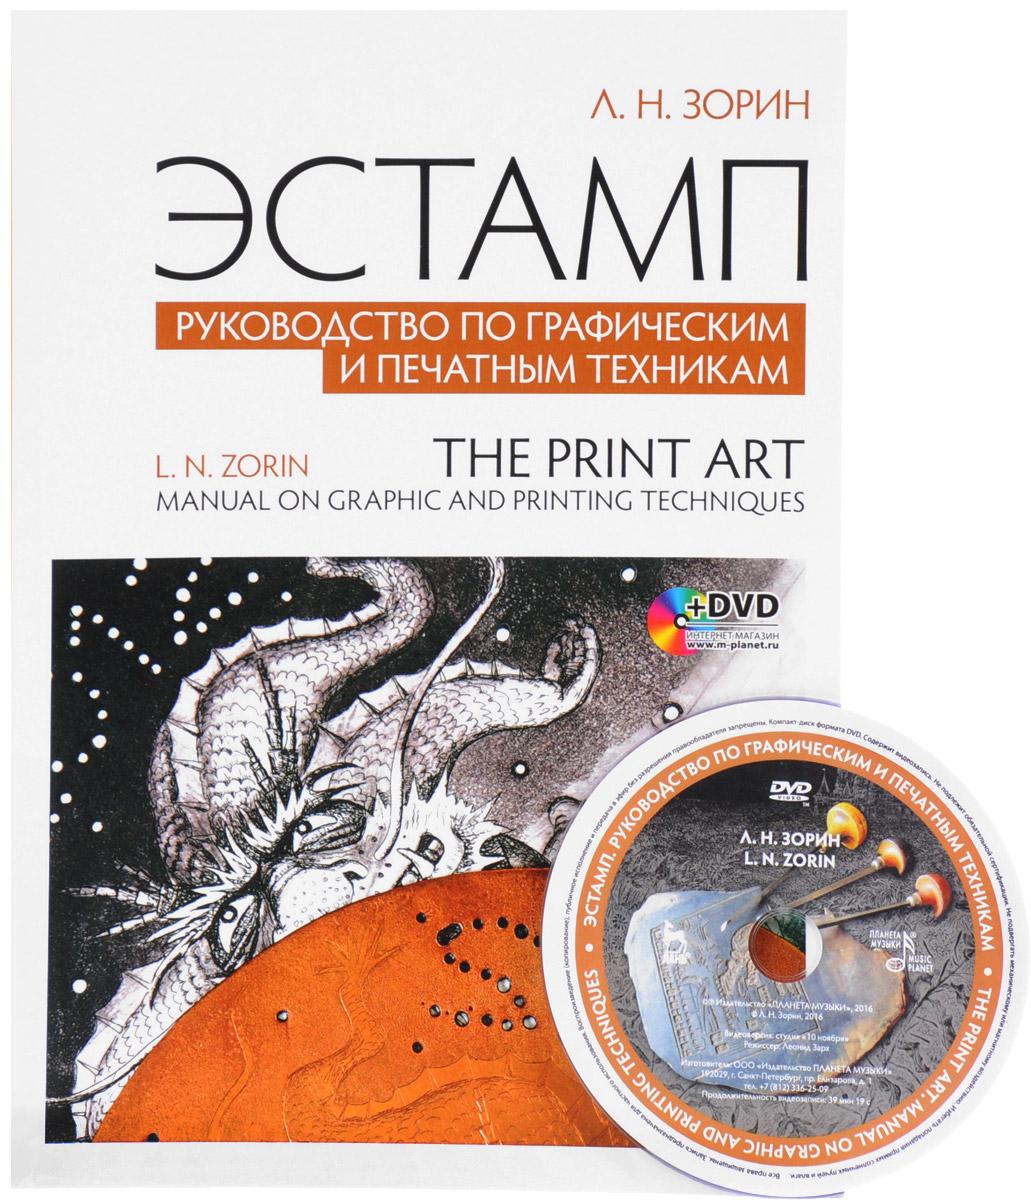 Эстамп. Руководство по графическим и печатным техникам. Учебное пособие / The Print Art: Manual on Graphic and Printing Techniques: Textbook (+DVD)